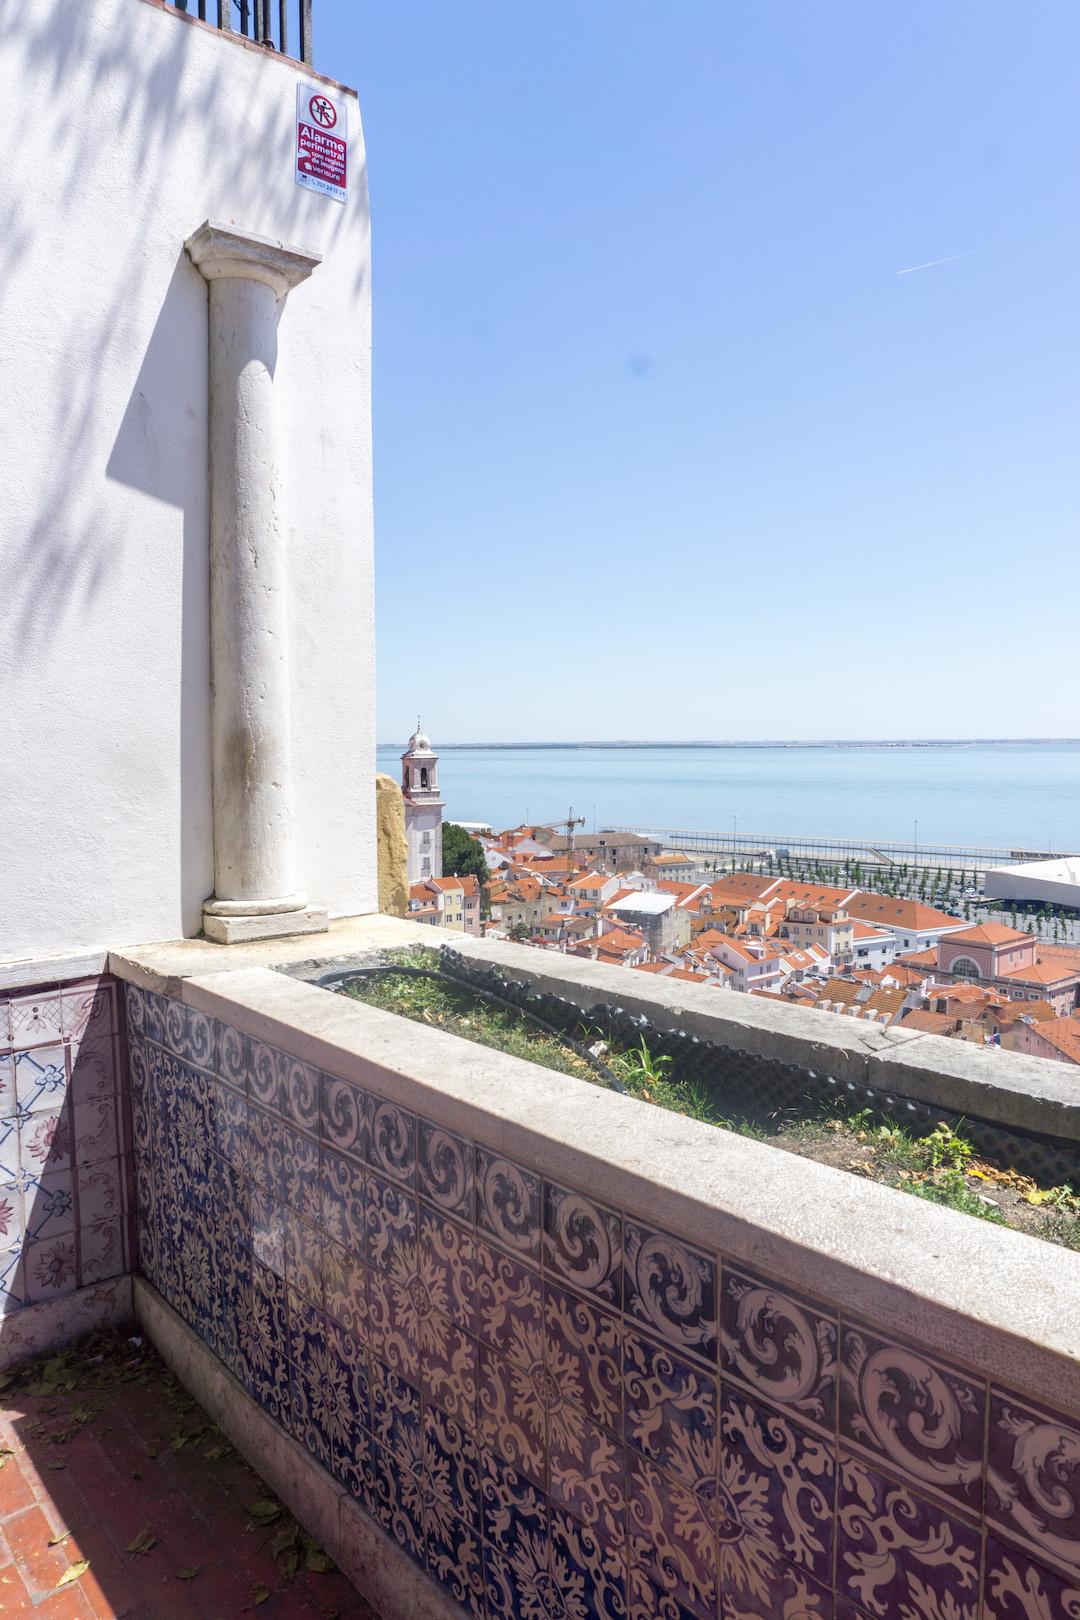 Her_Travel_Edit_Lisbon_Miradouro_de_Santa_Luzia_Views